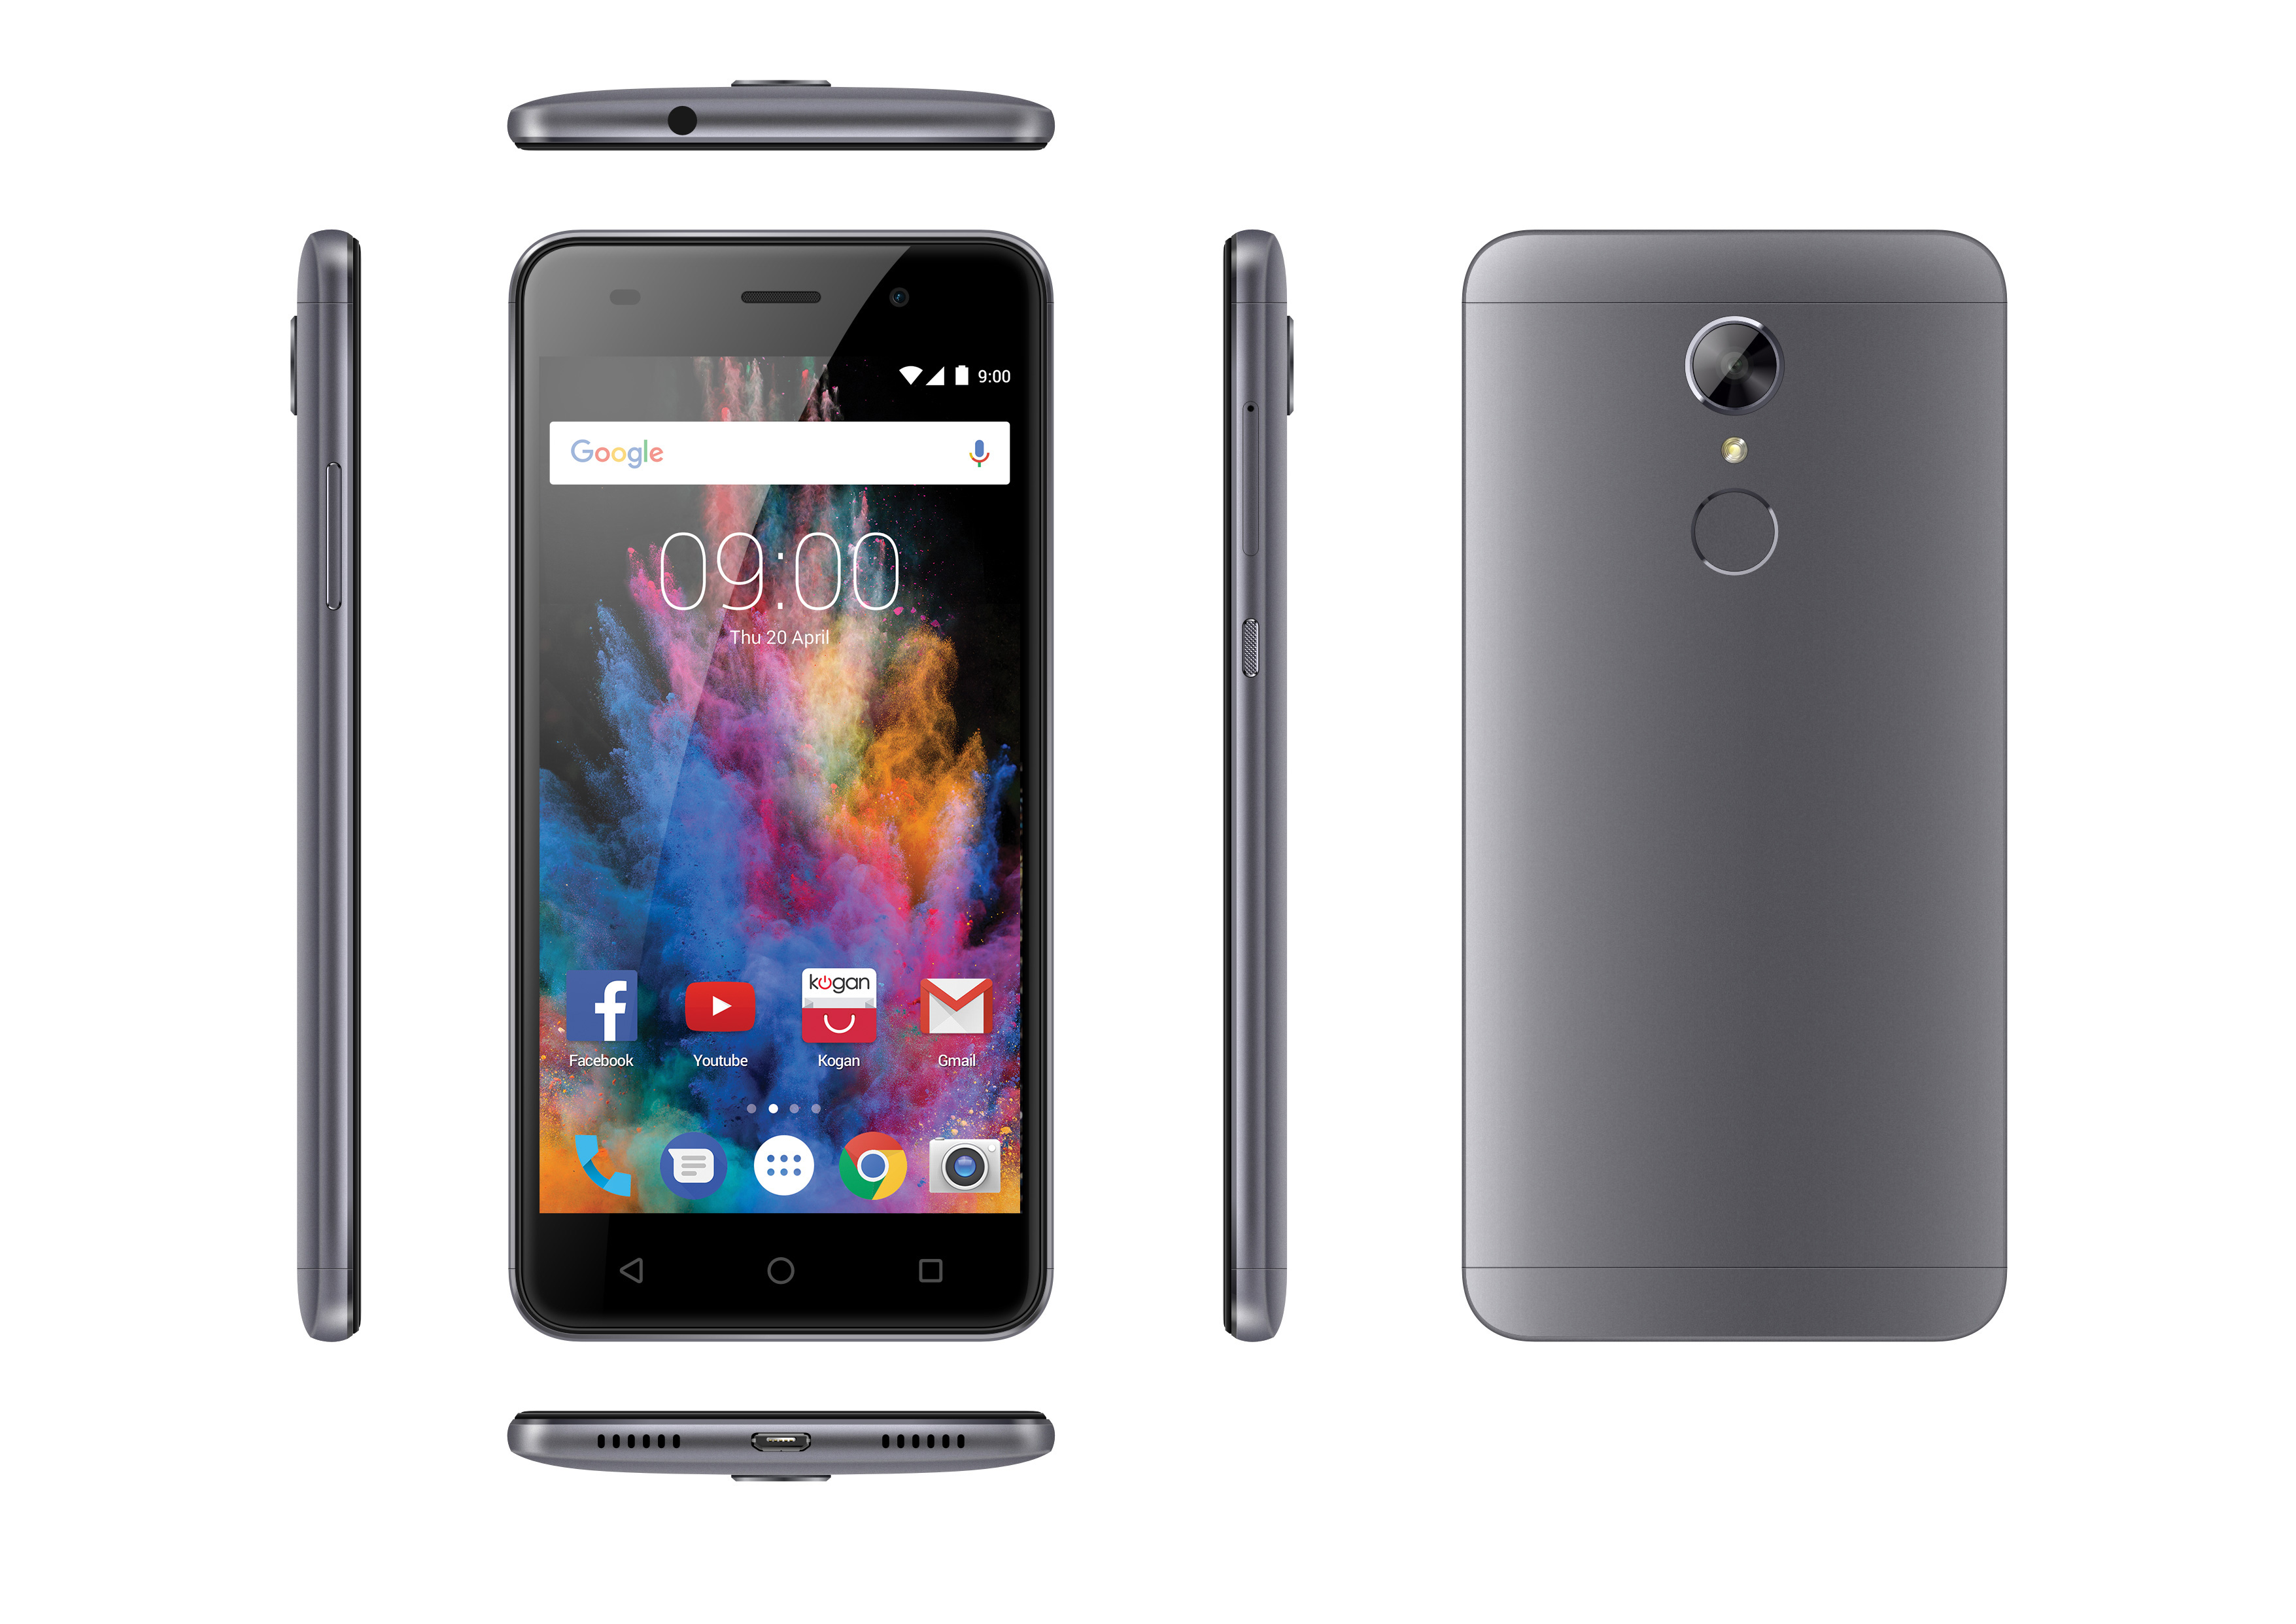 kogan s new smartphone kogan agora 8 199 eftm rh eftm com Samsung Smartphones Verizon User Manual BlackBerry User Guide Manuals